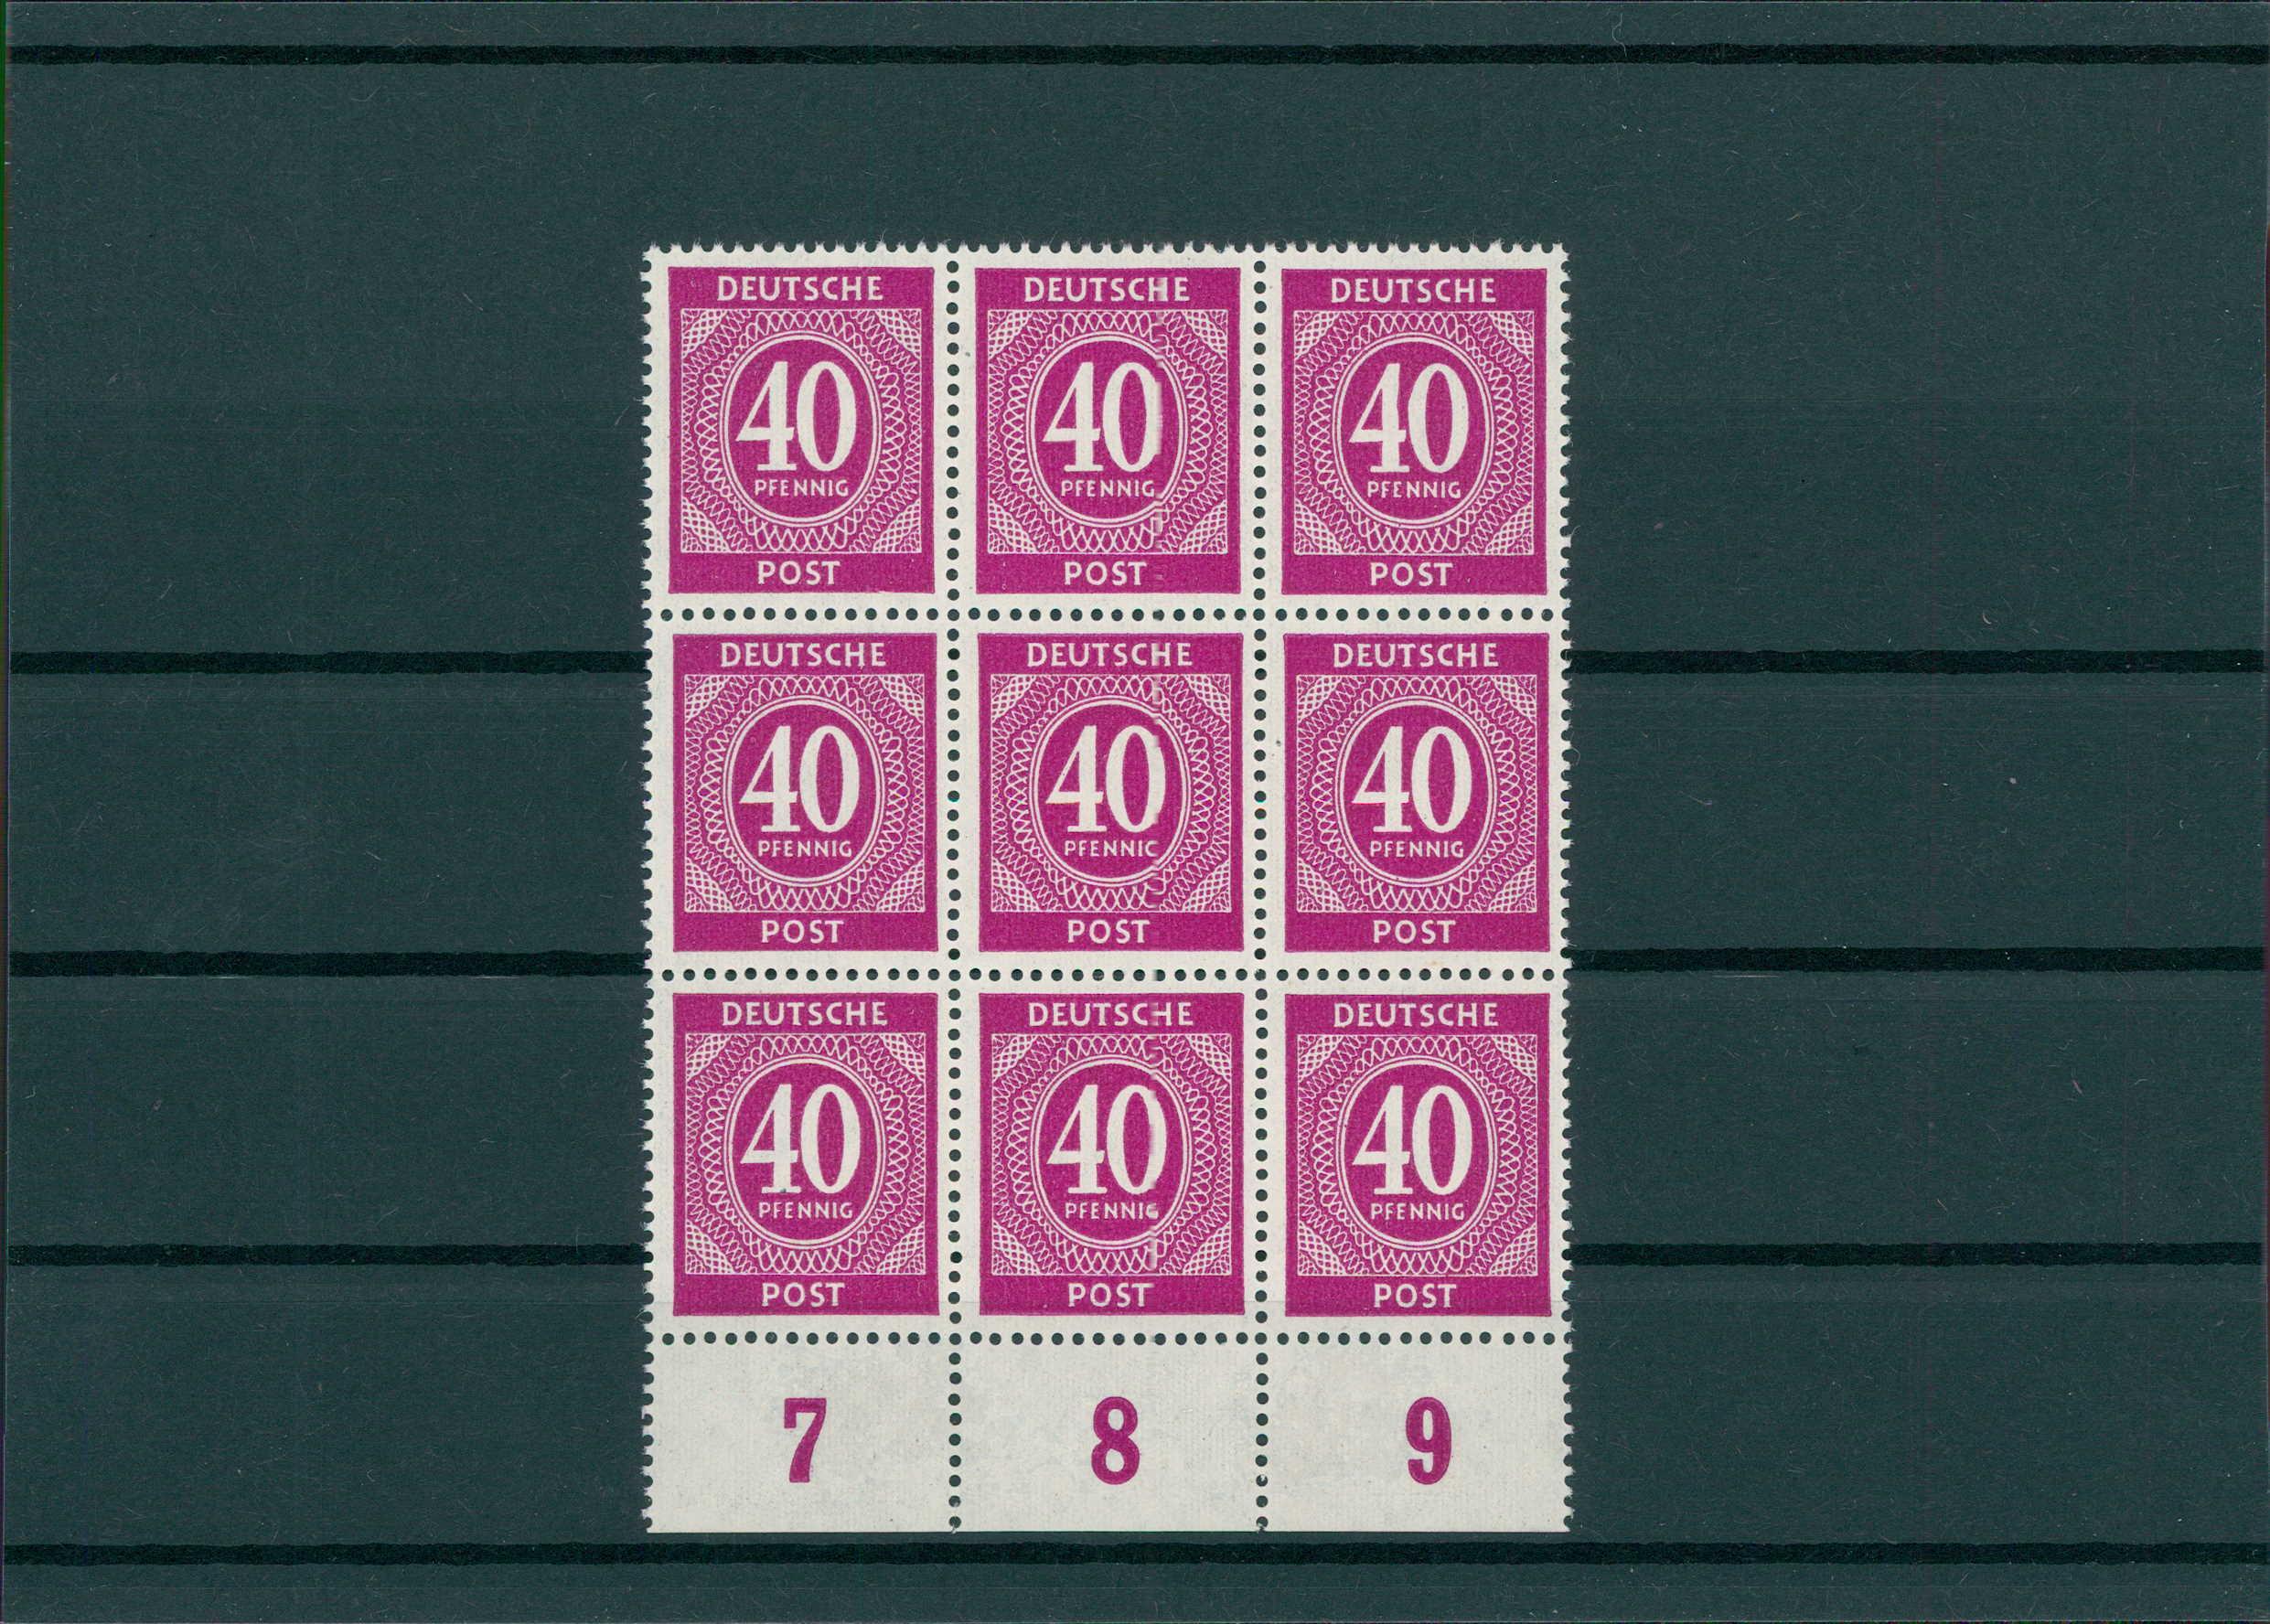 Belgien 110 Belgien 3545 **markenheftchen